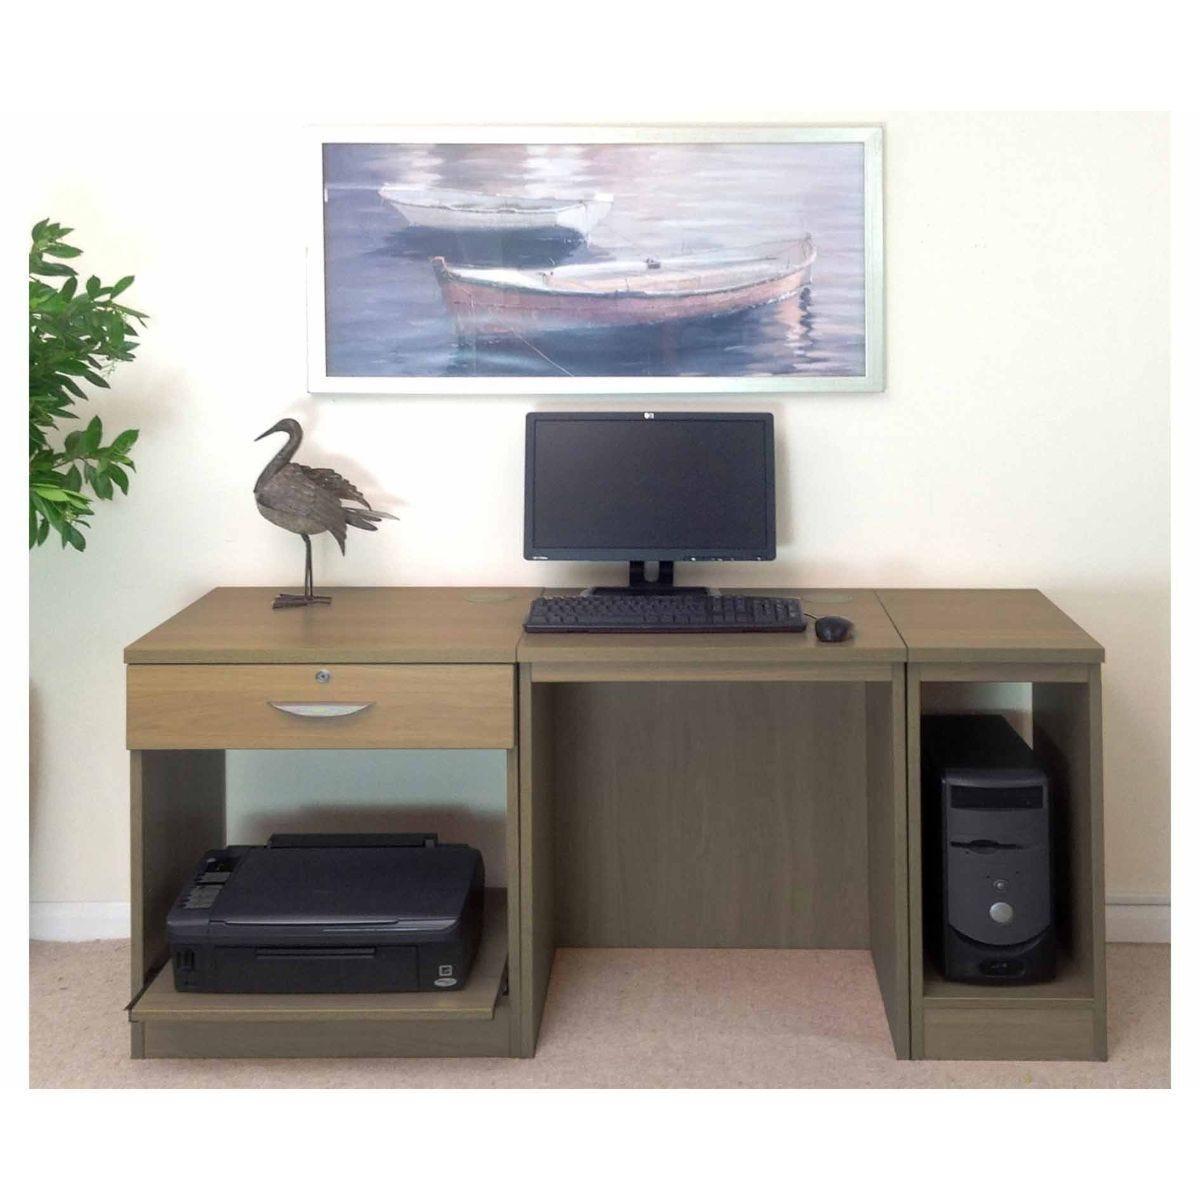 R White Home Office Furniture Desk English Oak Wood Grain